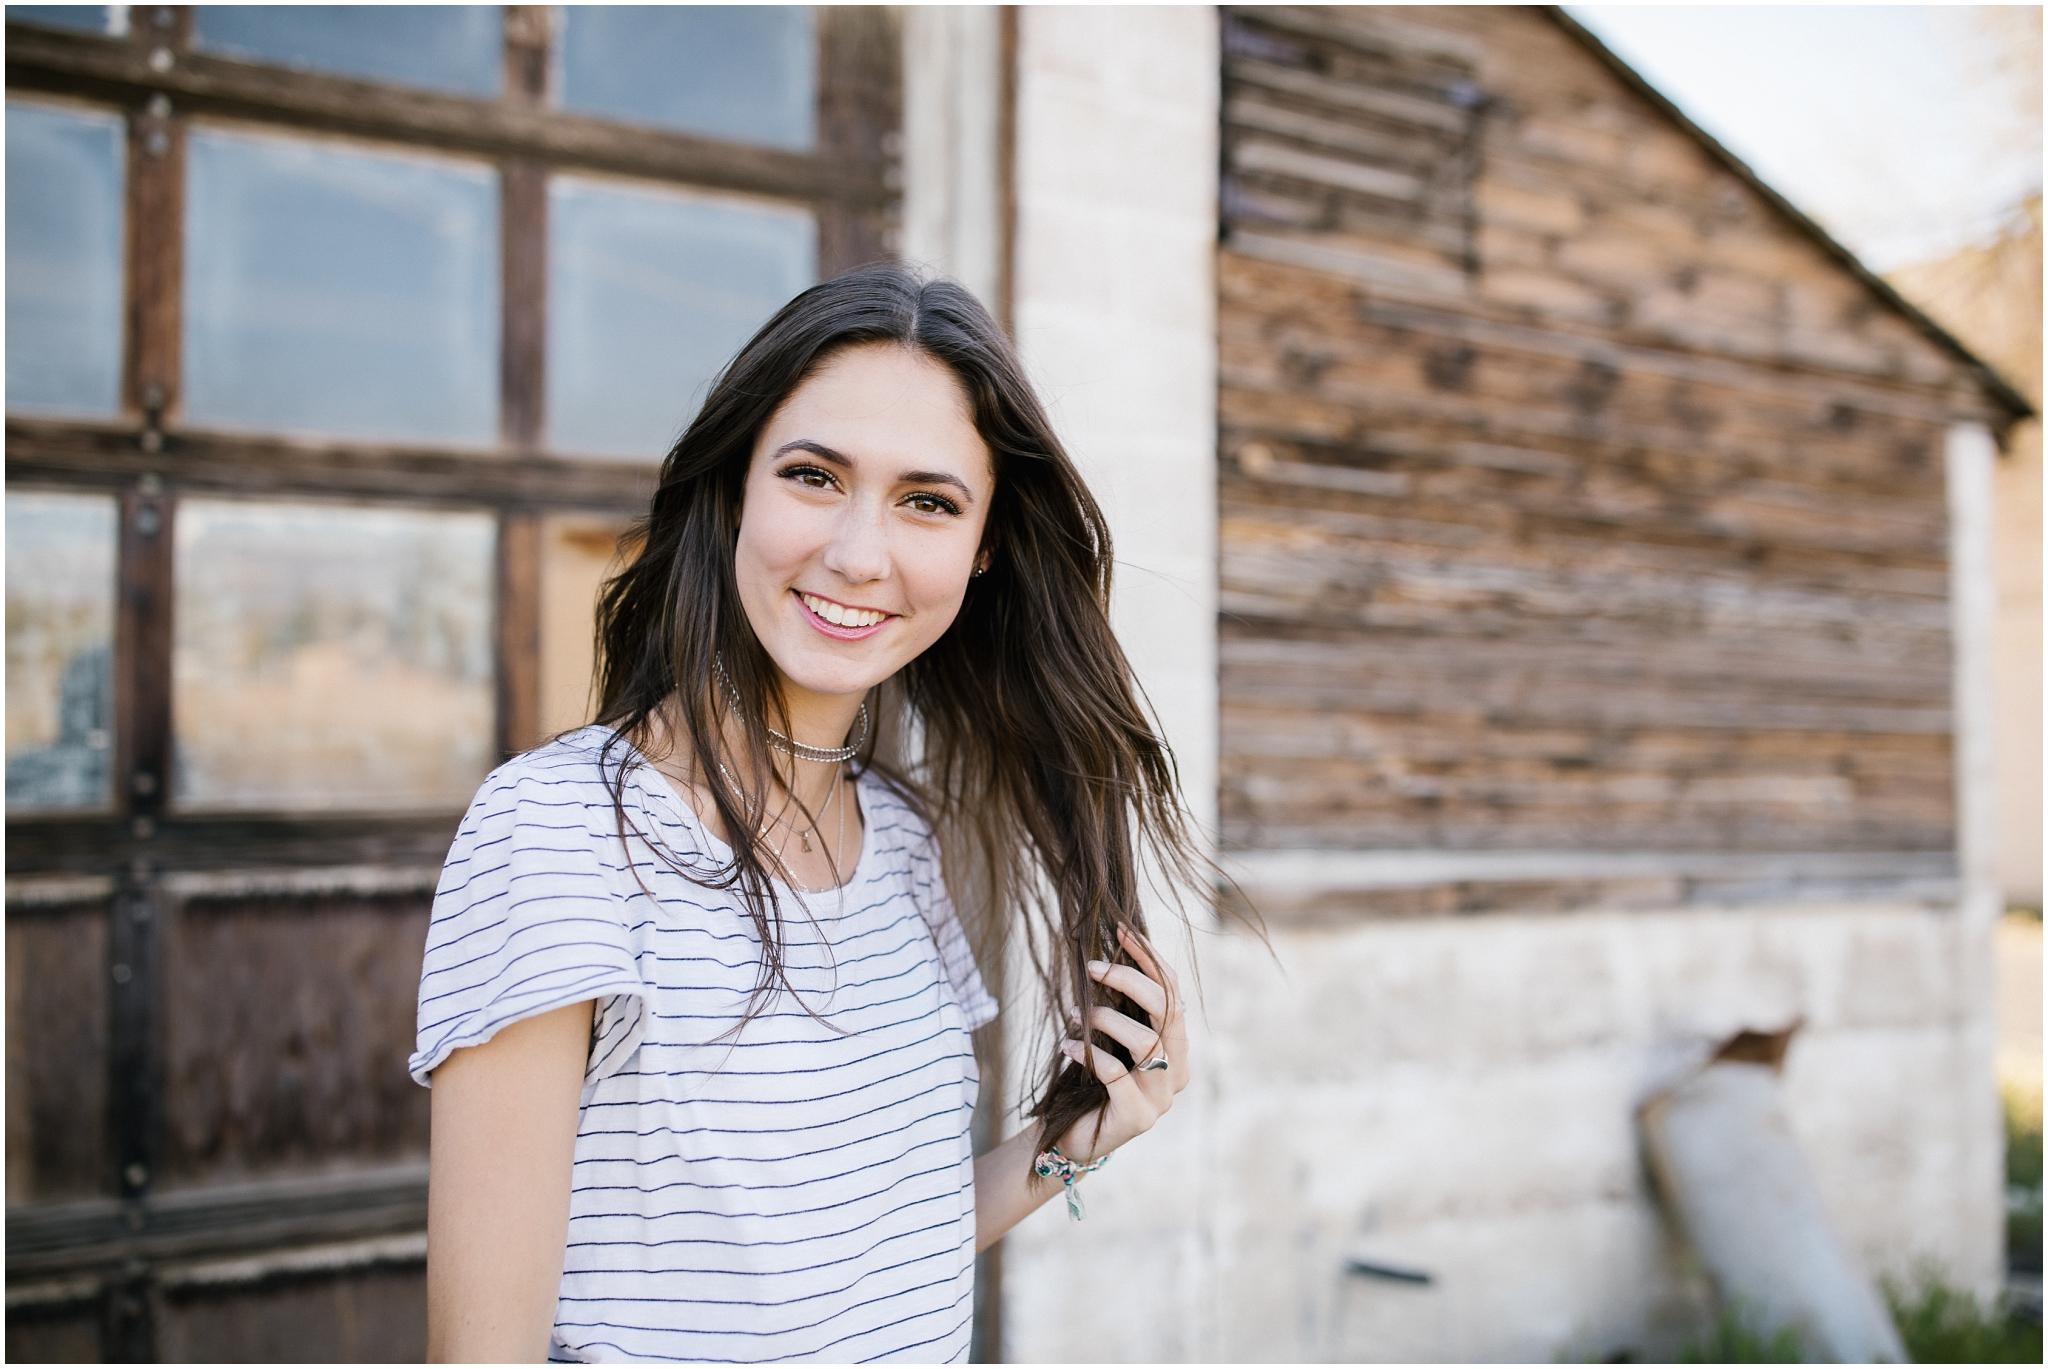 Lizzie-B-Imagery-Utah-Senior-Photographer-Central- Utah-Photographer-Utah-County_0012.jpg